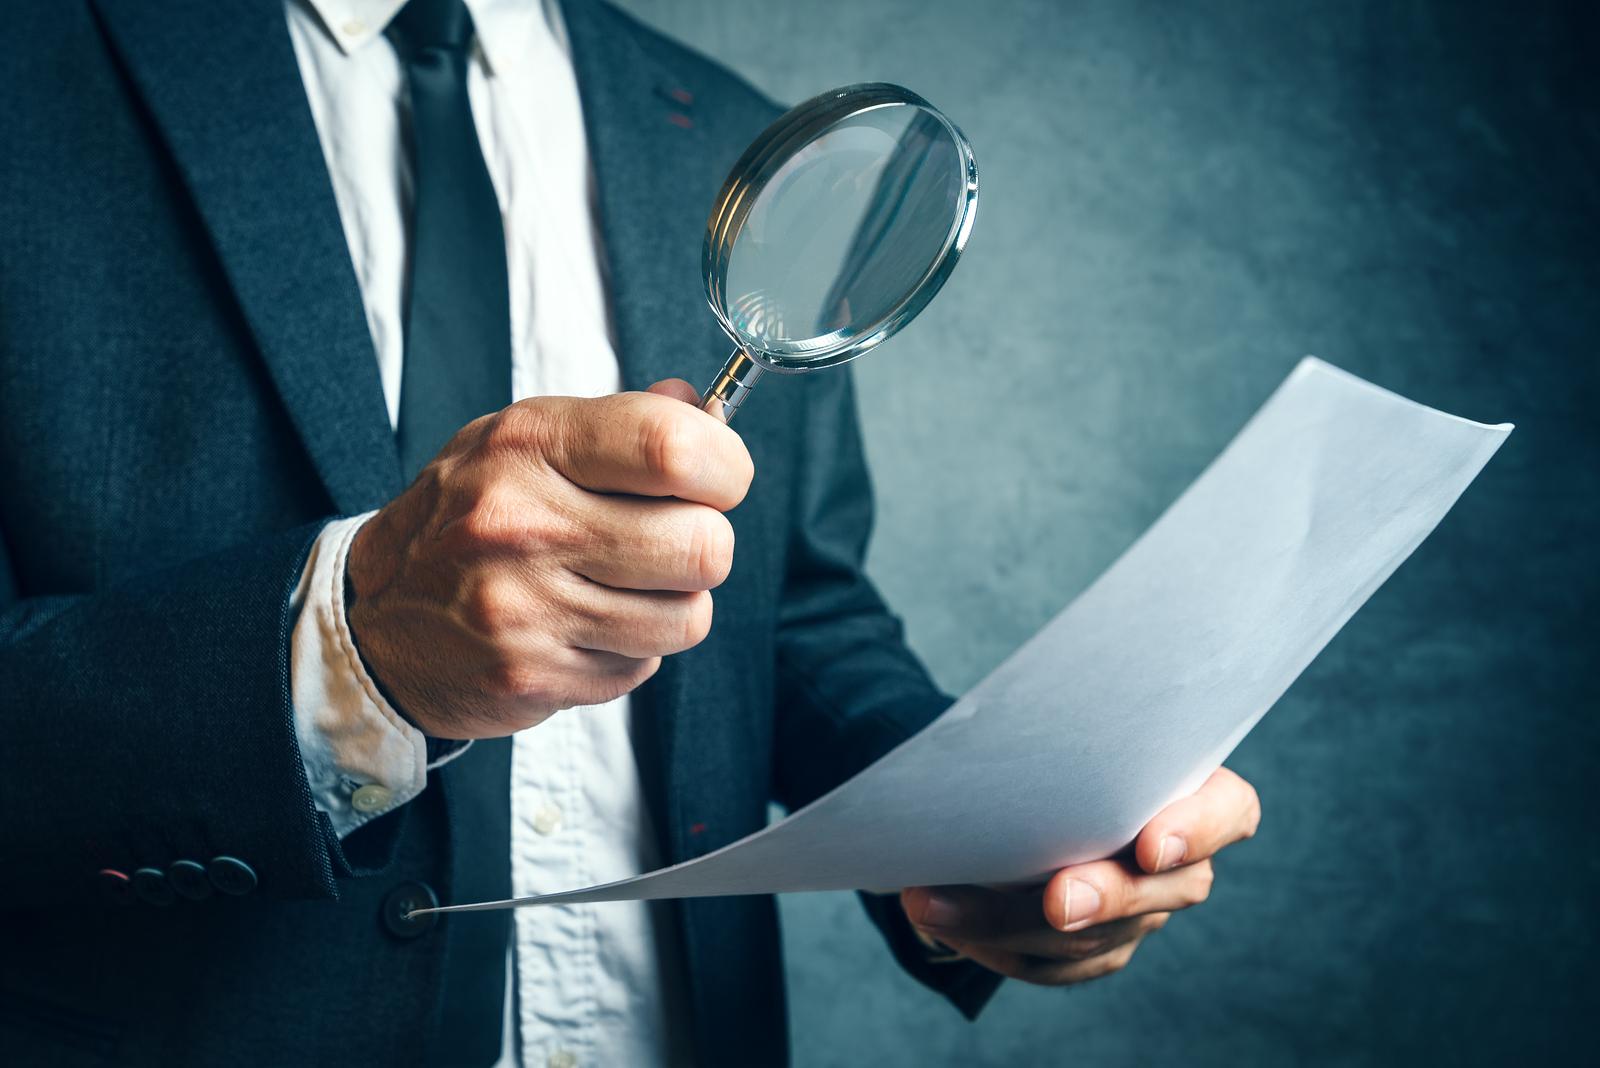 NLP case study: Identify Documents Similarity